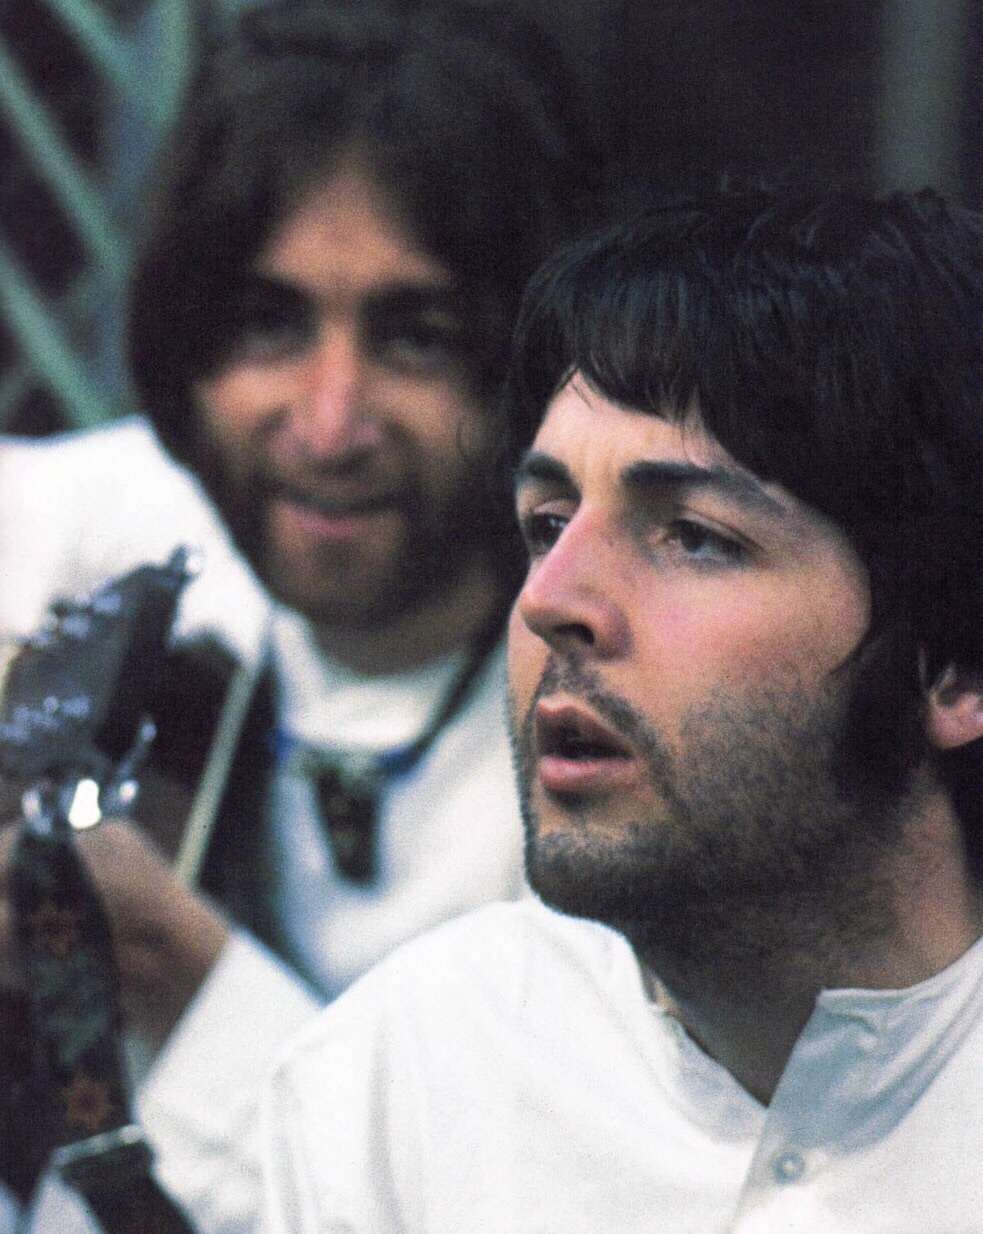 John Lennon and Paul McCartney jamming in India, 1968.